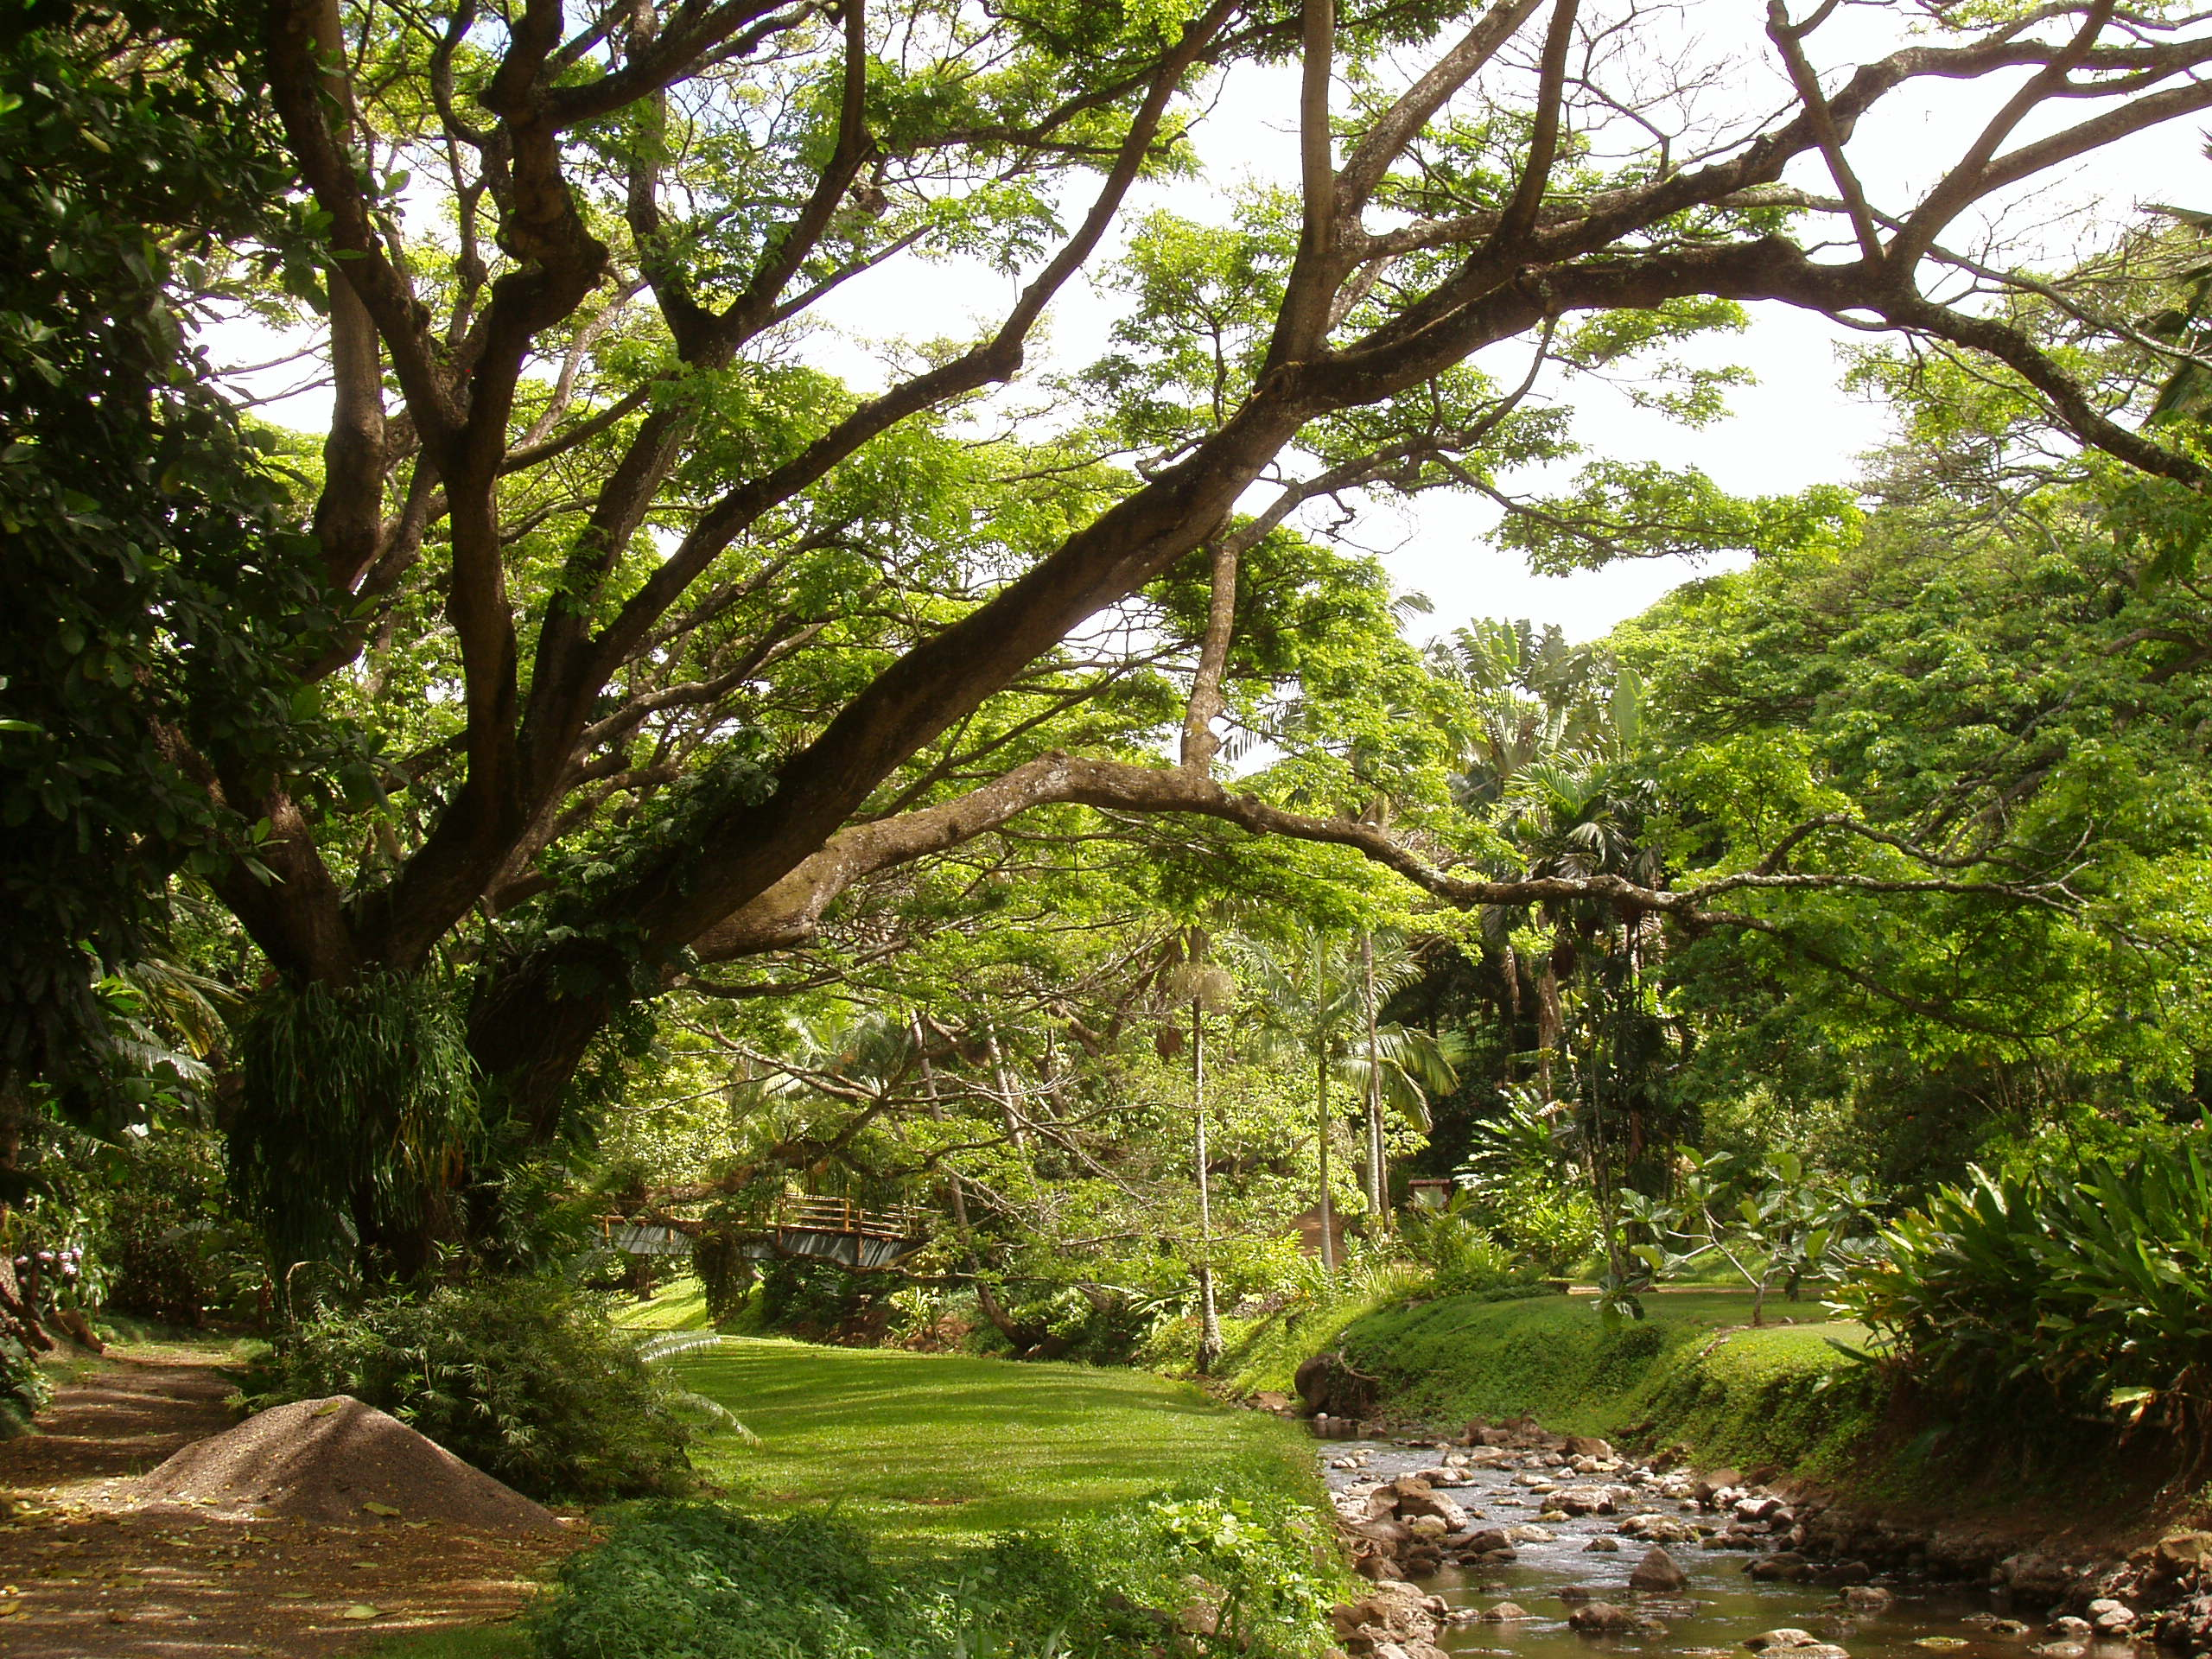 Lovely Image Credits: McBryde Garden, ...